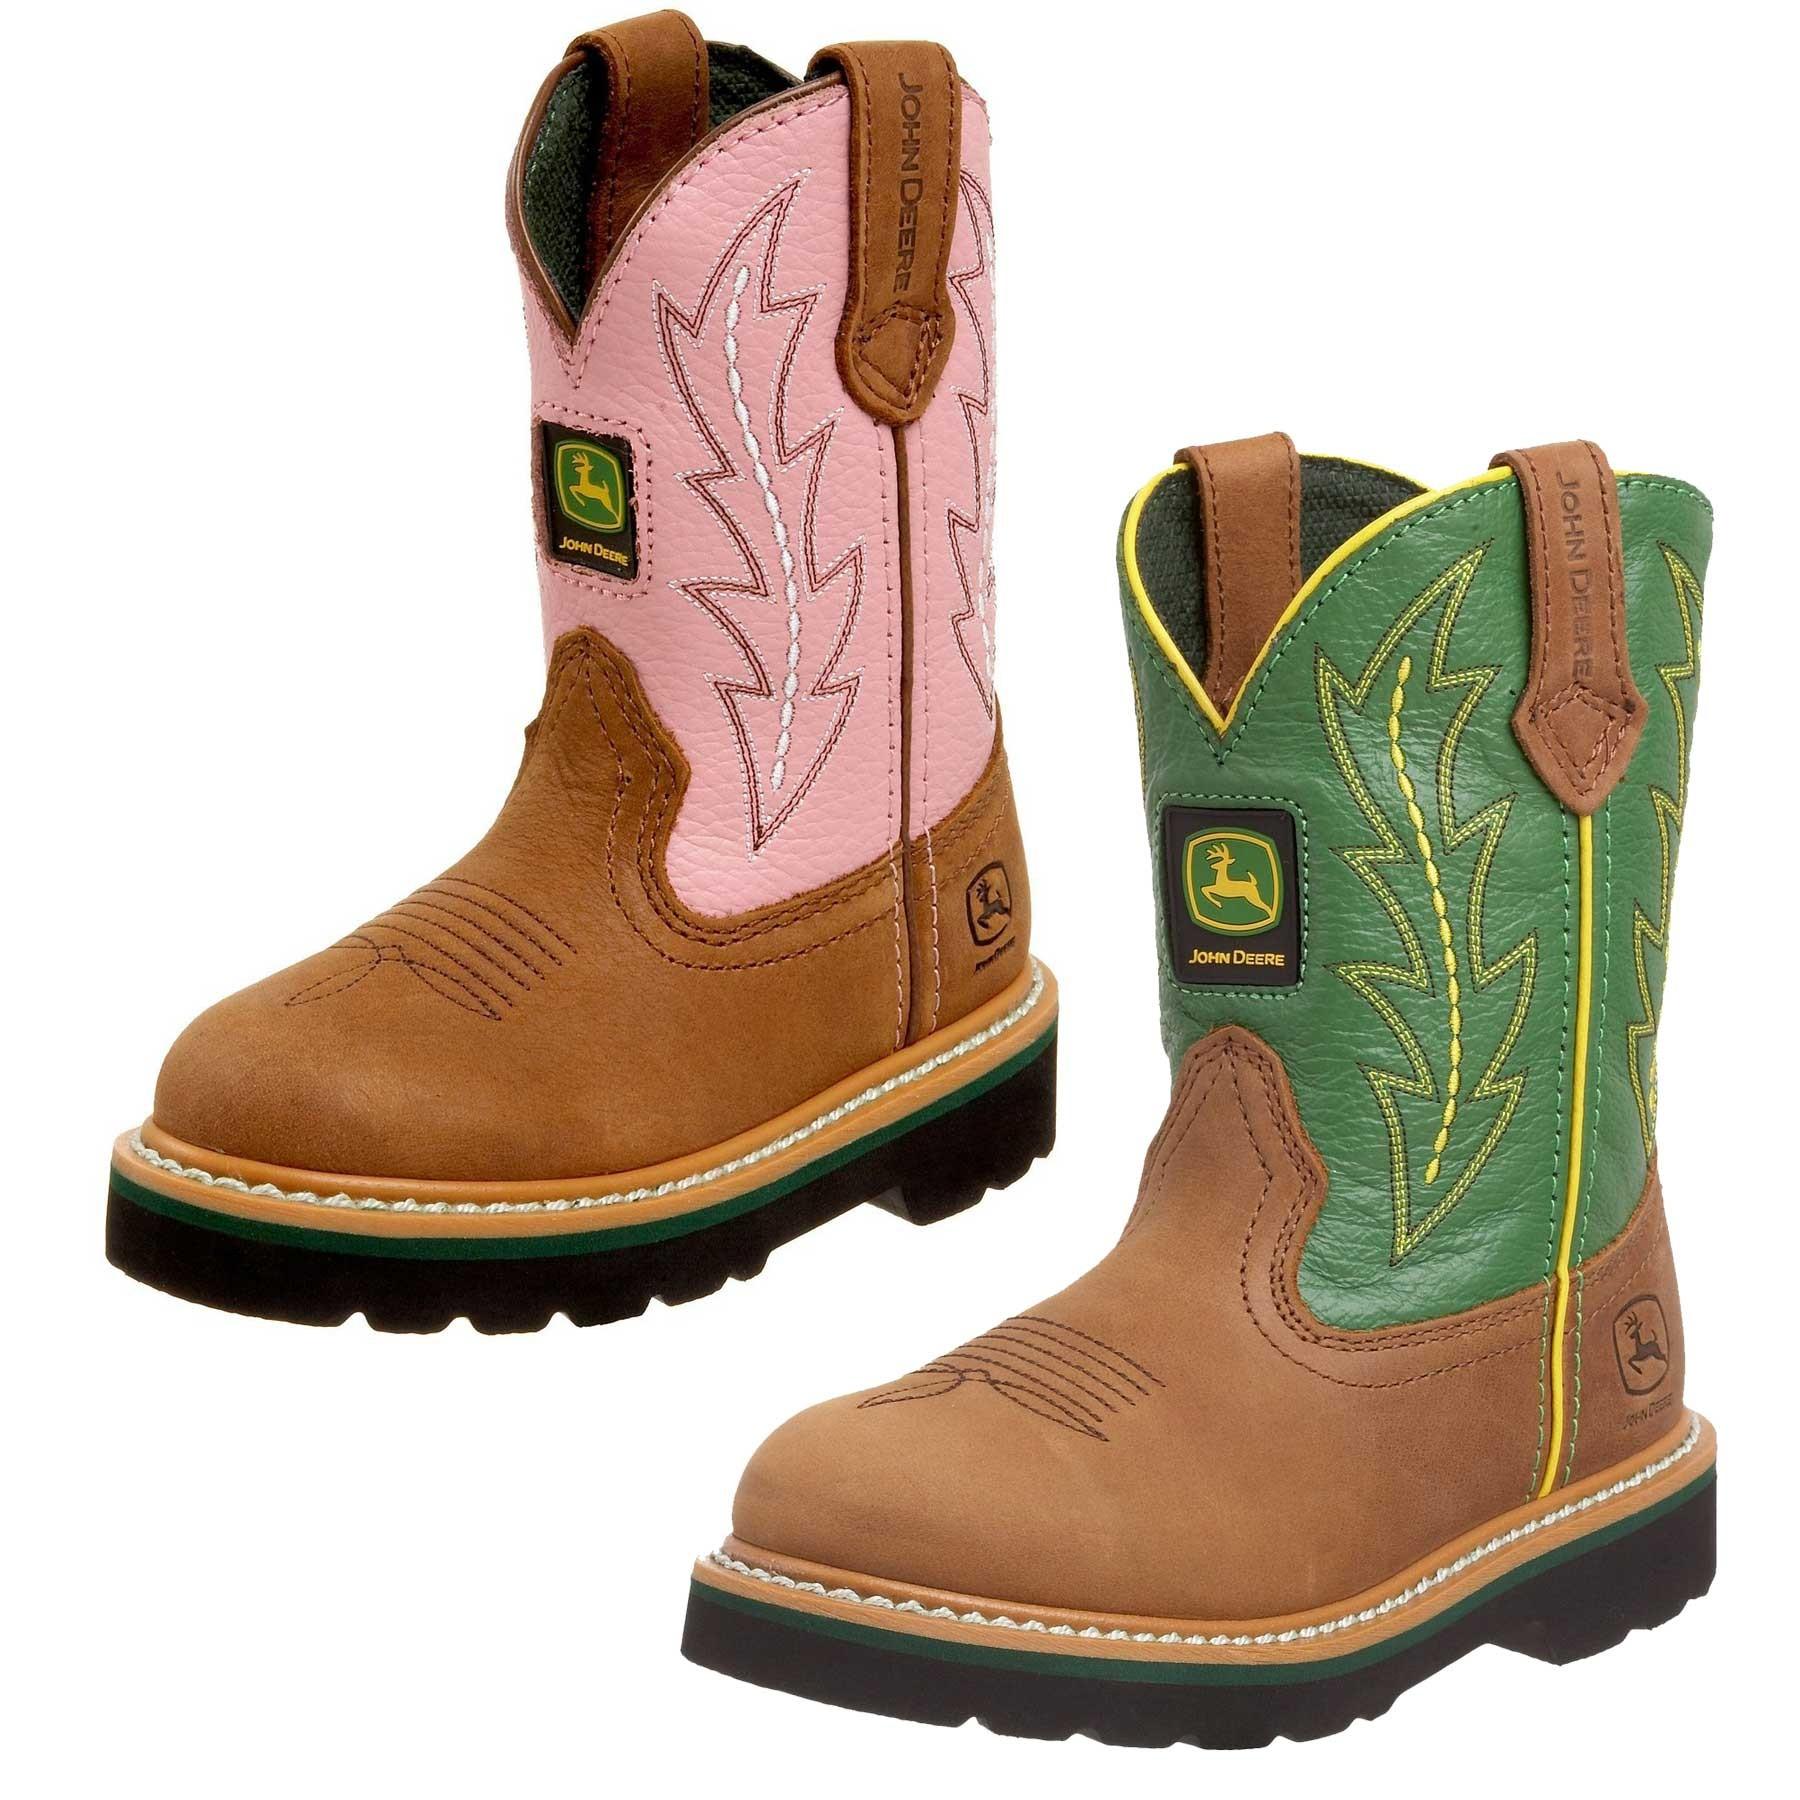 john deere boots john deere childrenu0027s wellington boots ... bpqoaav